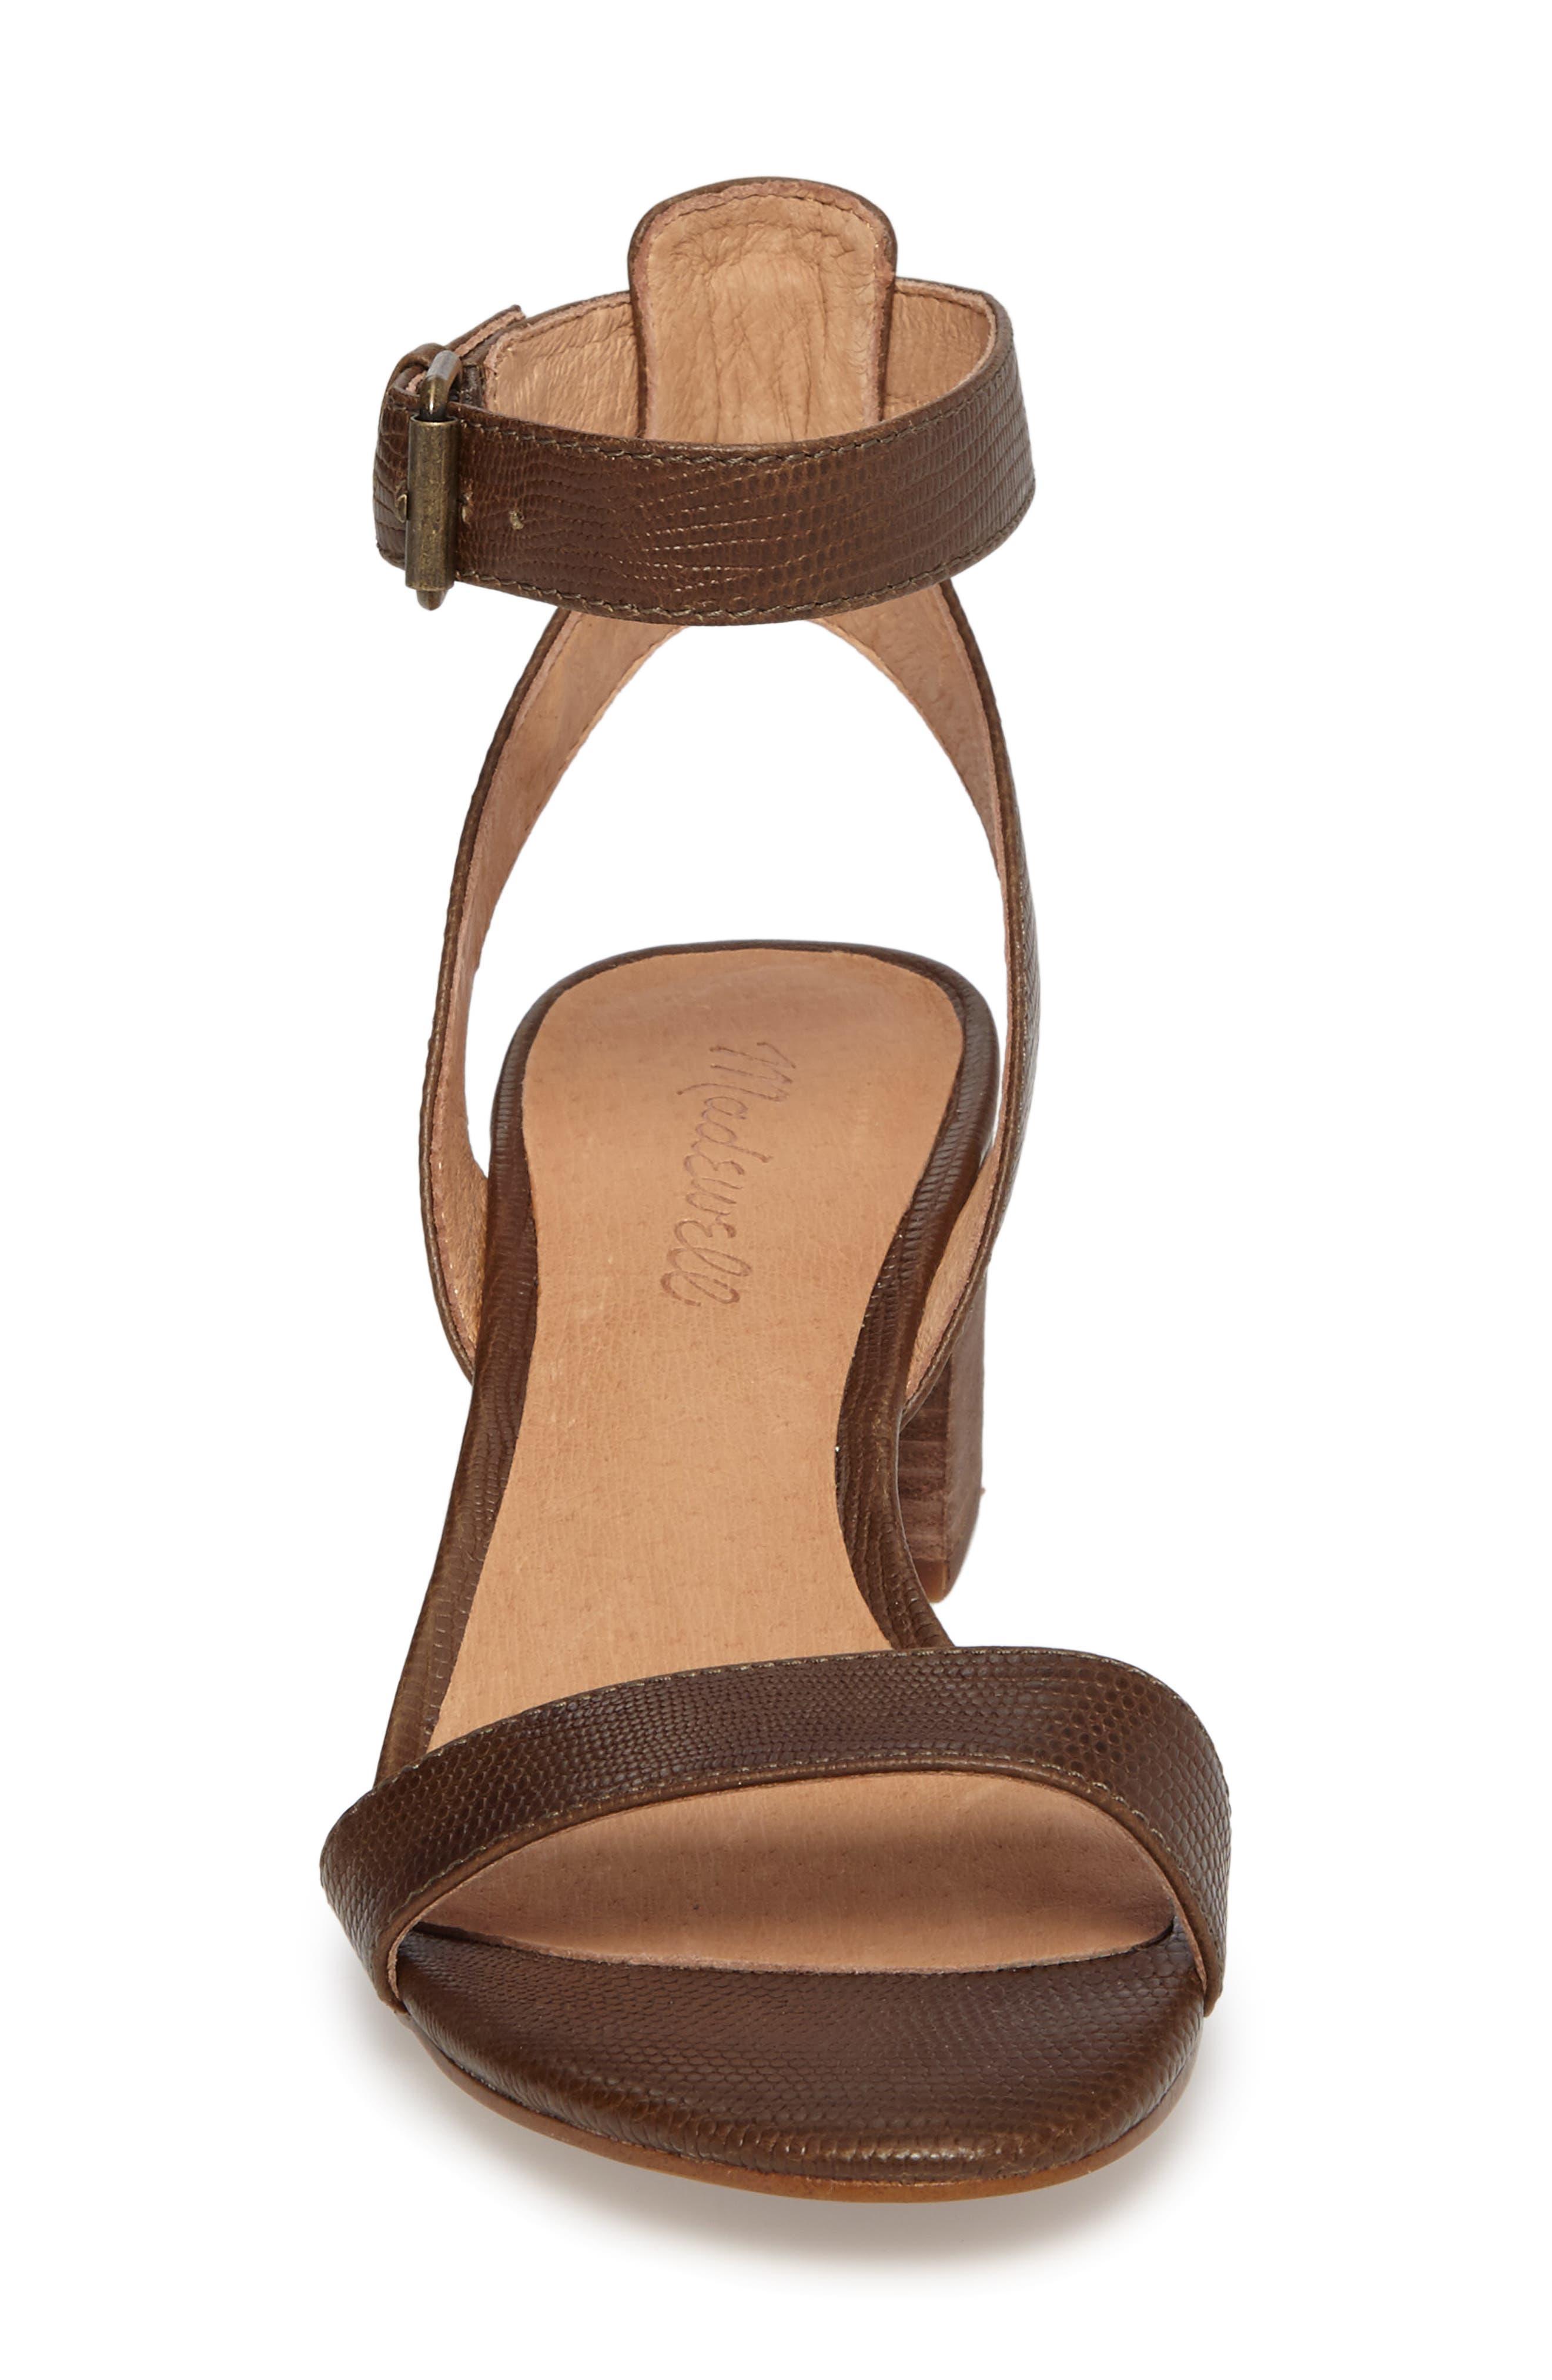 Alice Embossed Ankle Wrap Sandal,                             Alternate thumbnail 4, color,                             250